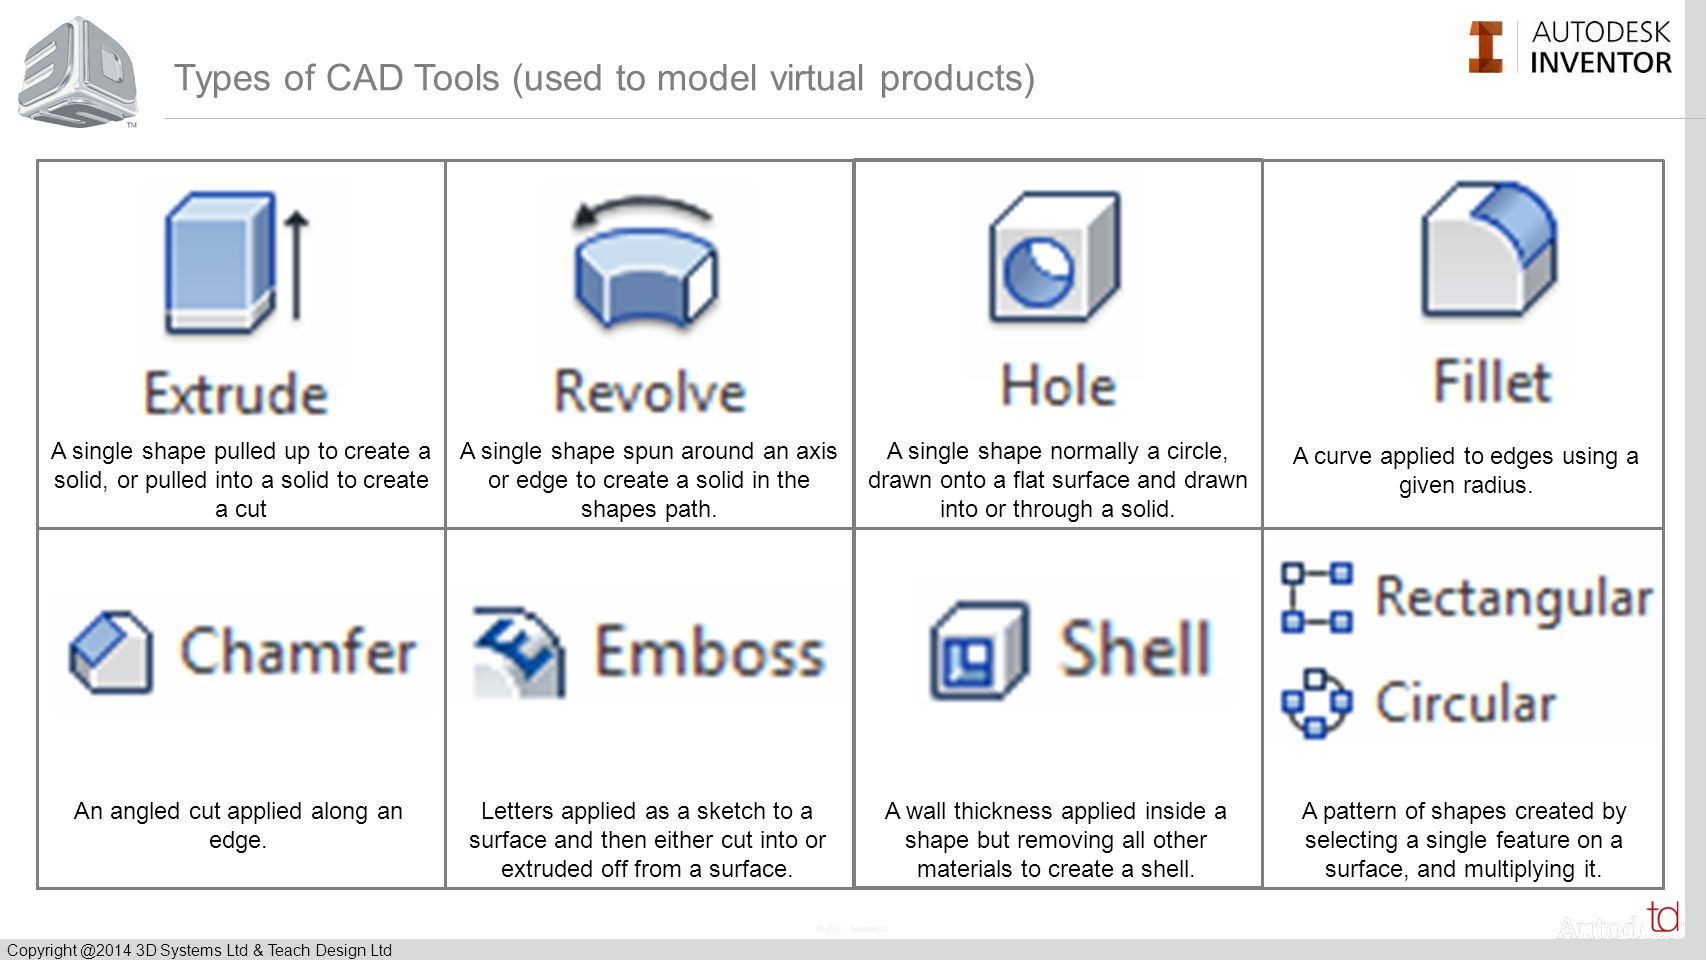 © 2012 Autodesk Copyright @2014 3D Systems Ltd & Teach Design Ltd To explore existing products and establish design features.